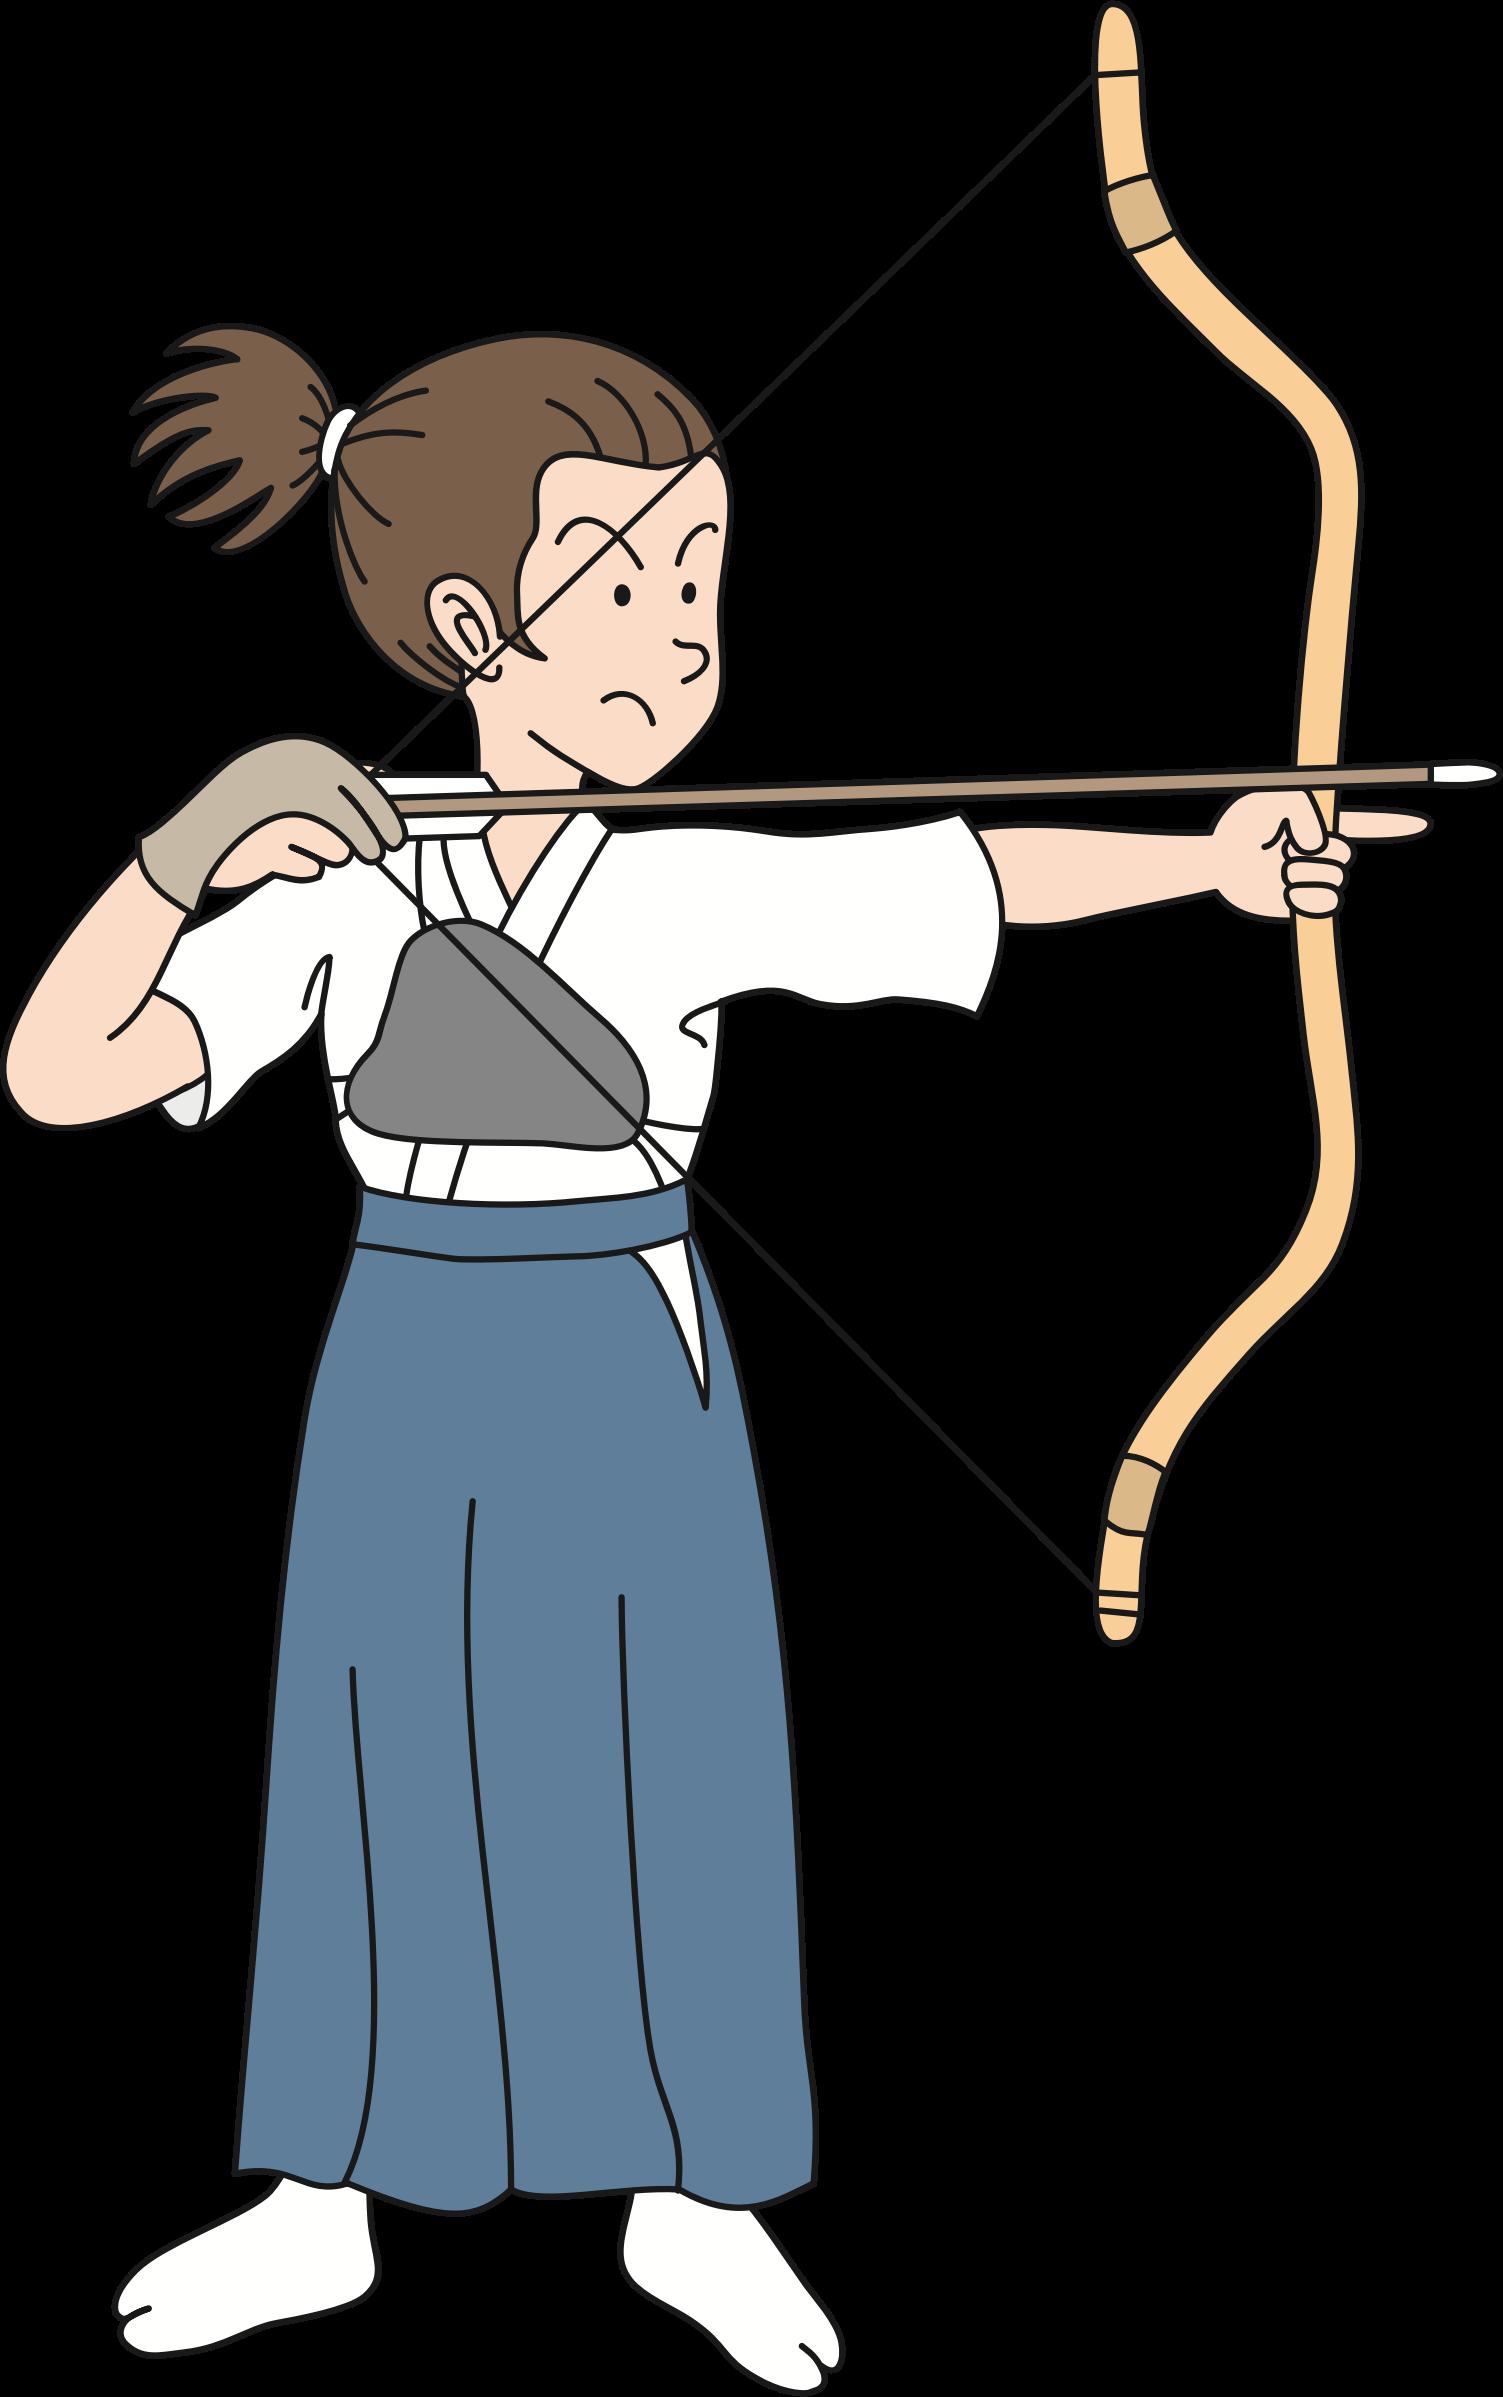 Clipart woman archery. Female archer big image